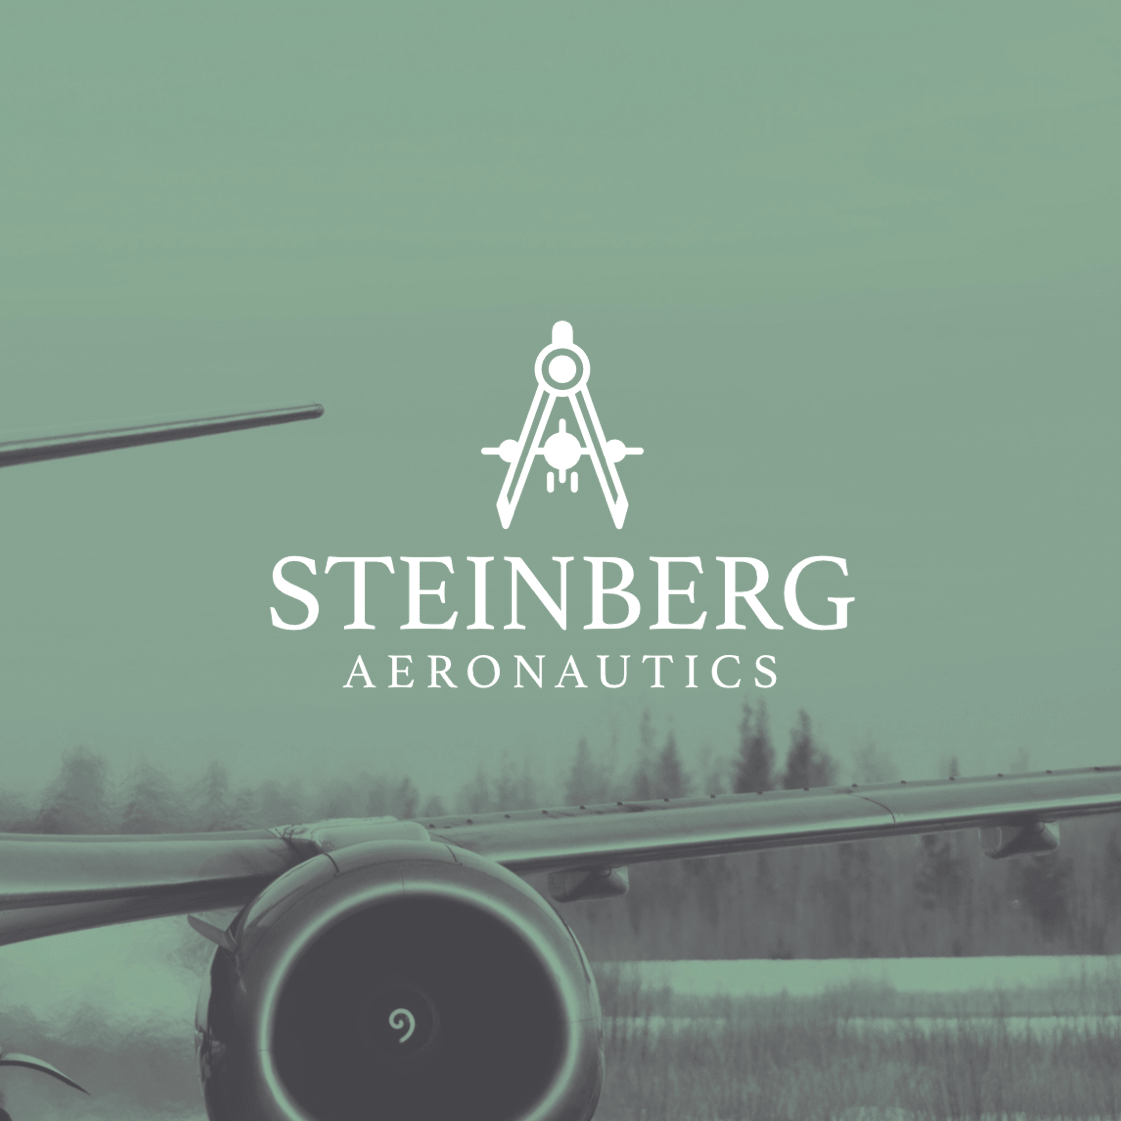 STEINBERG AERONAUTICS logo design